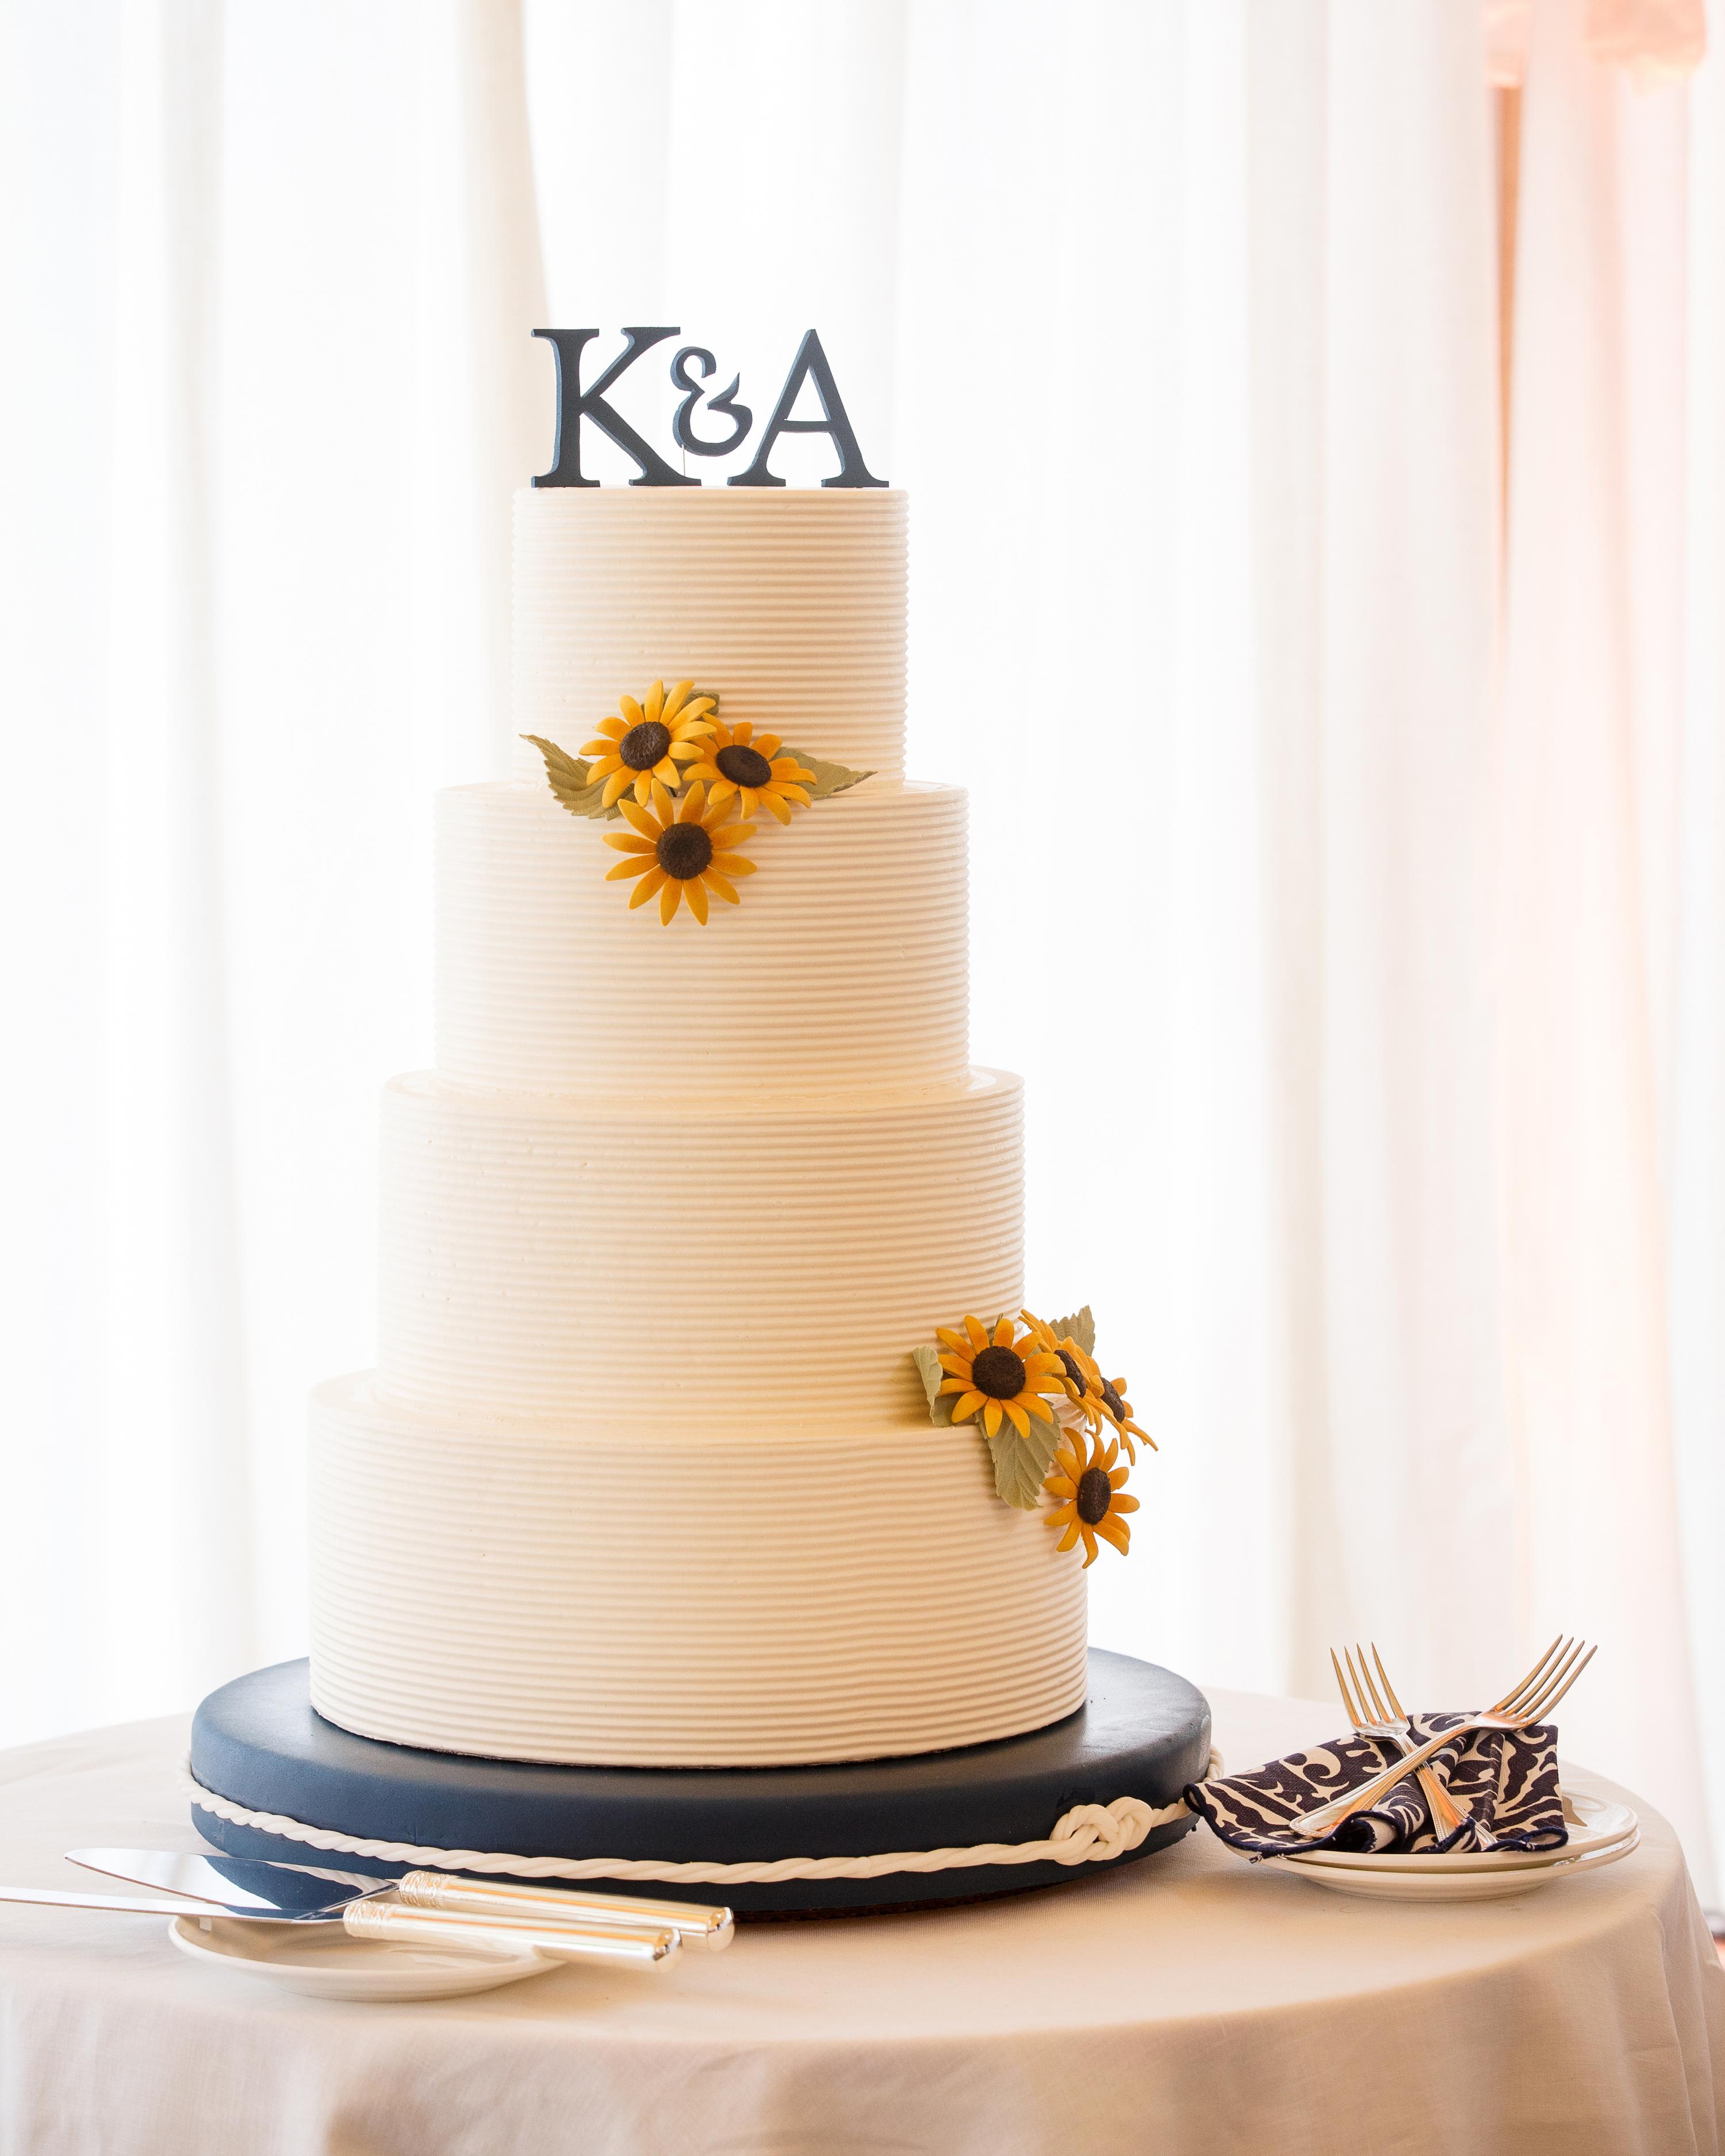 kristel-austin-wedding-cake-34-s11860-0415.jpg